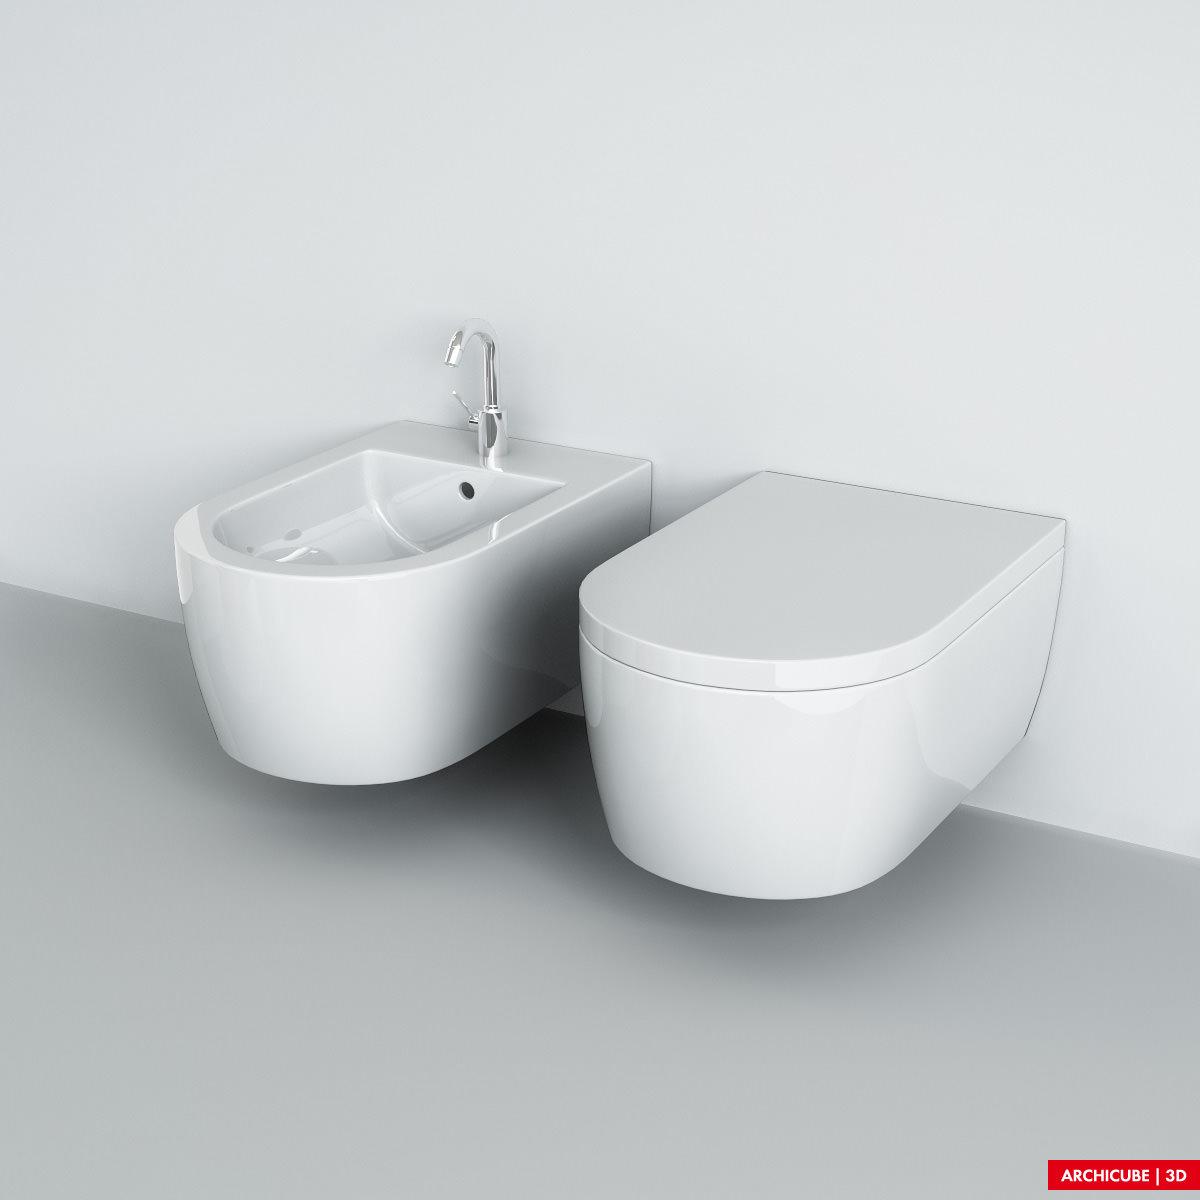 Wall mounted wc bidet 3d model max obj fbx - Wc model ...